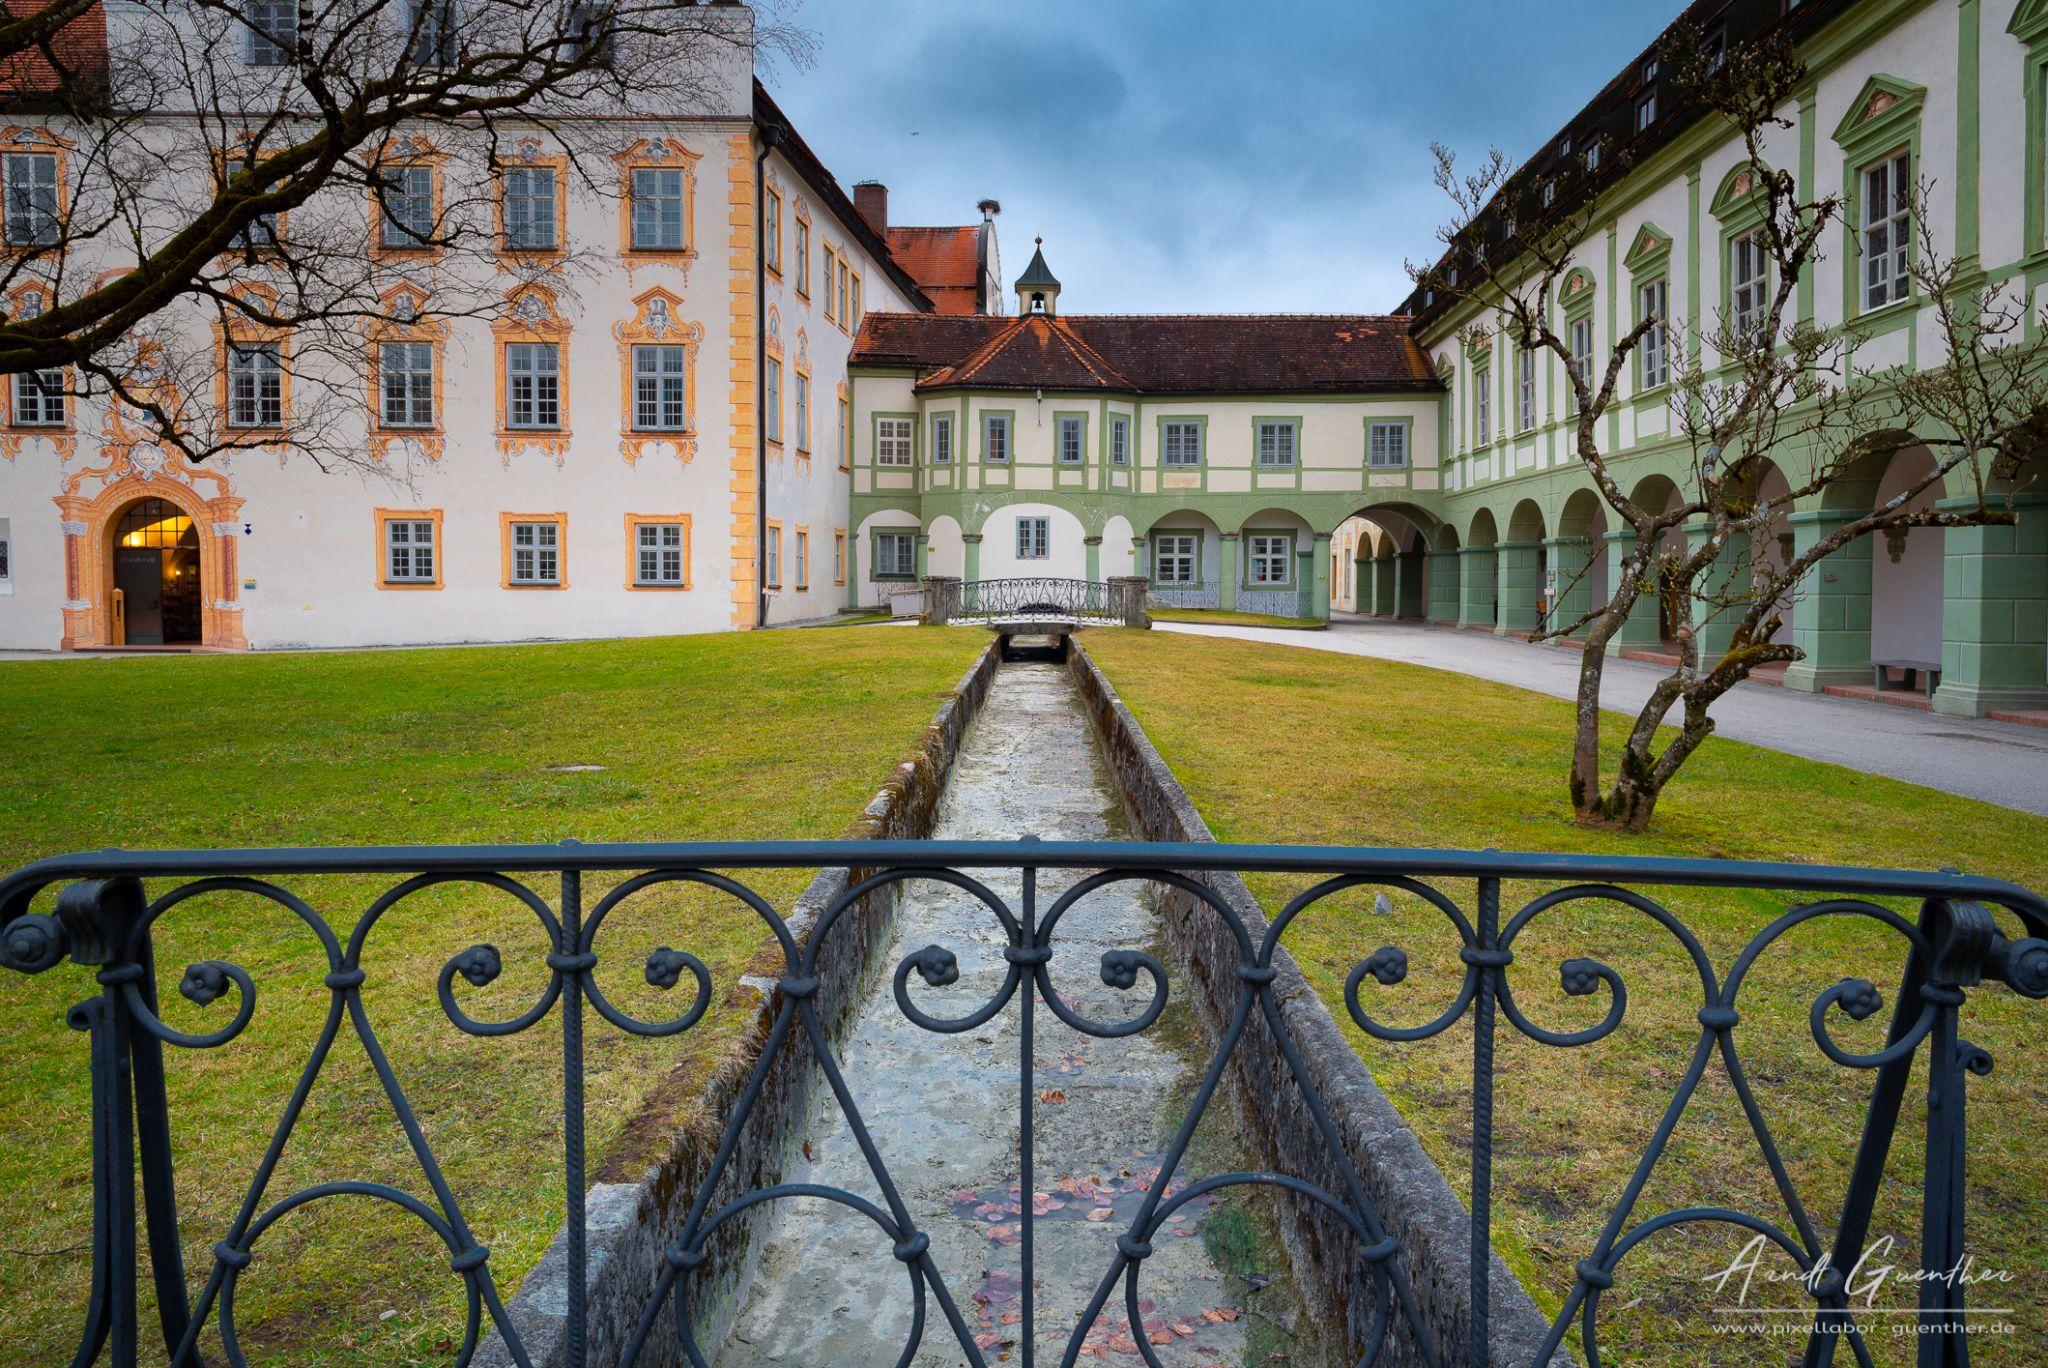 Kloster Benediktbeuern, Germany